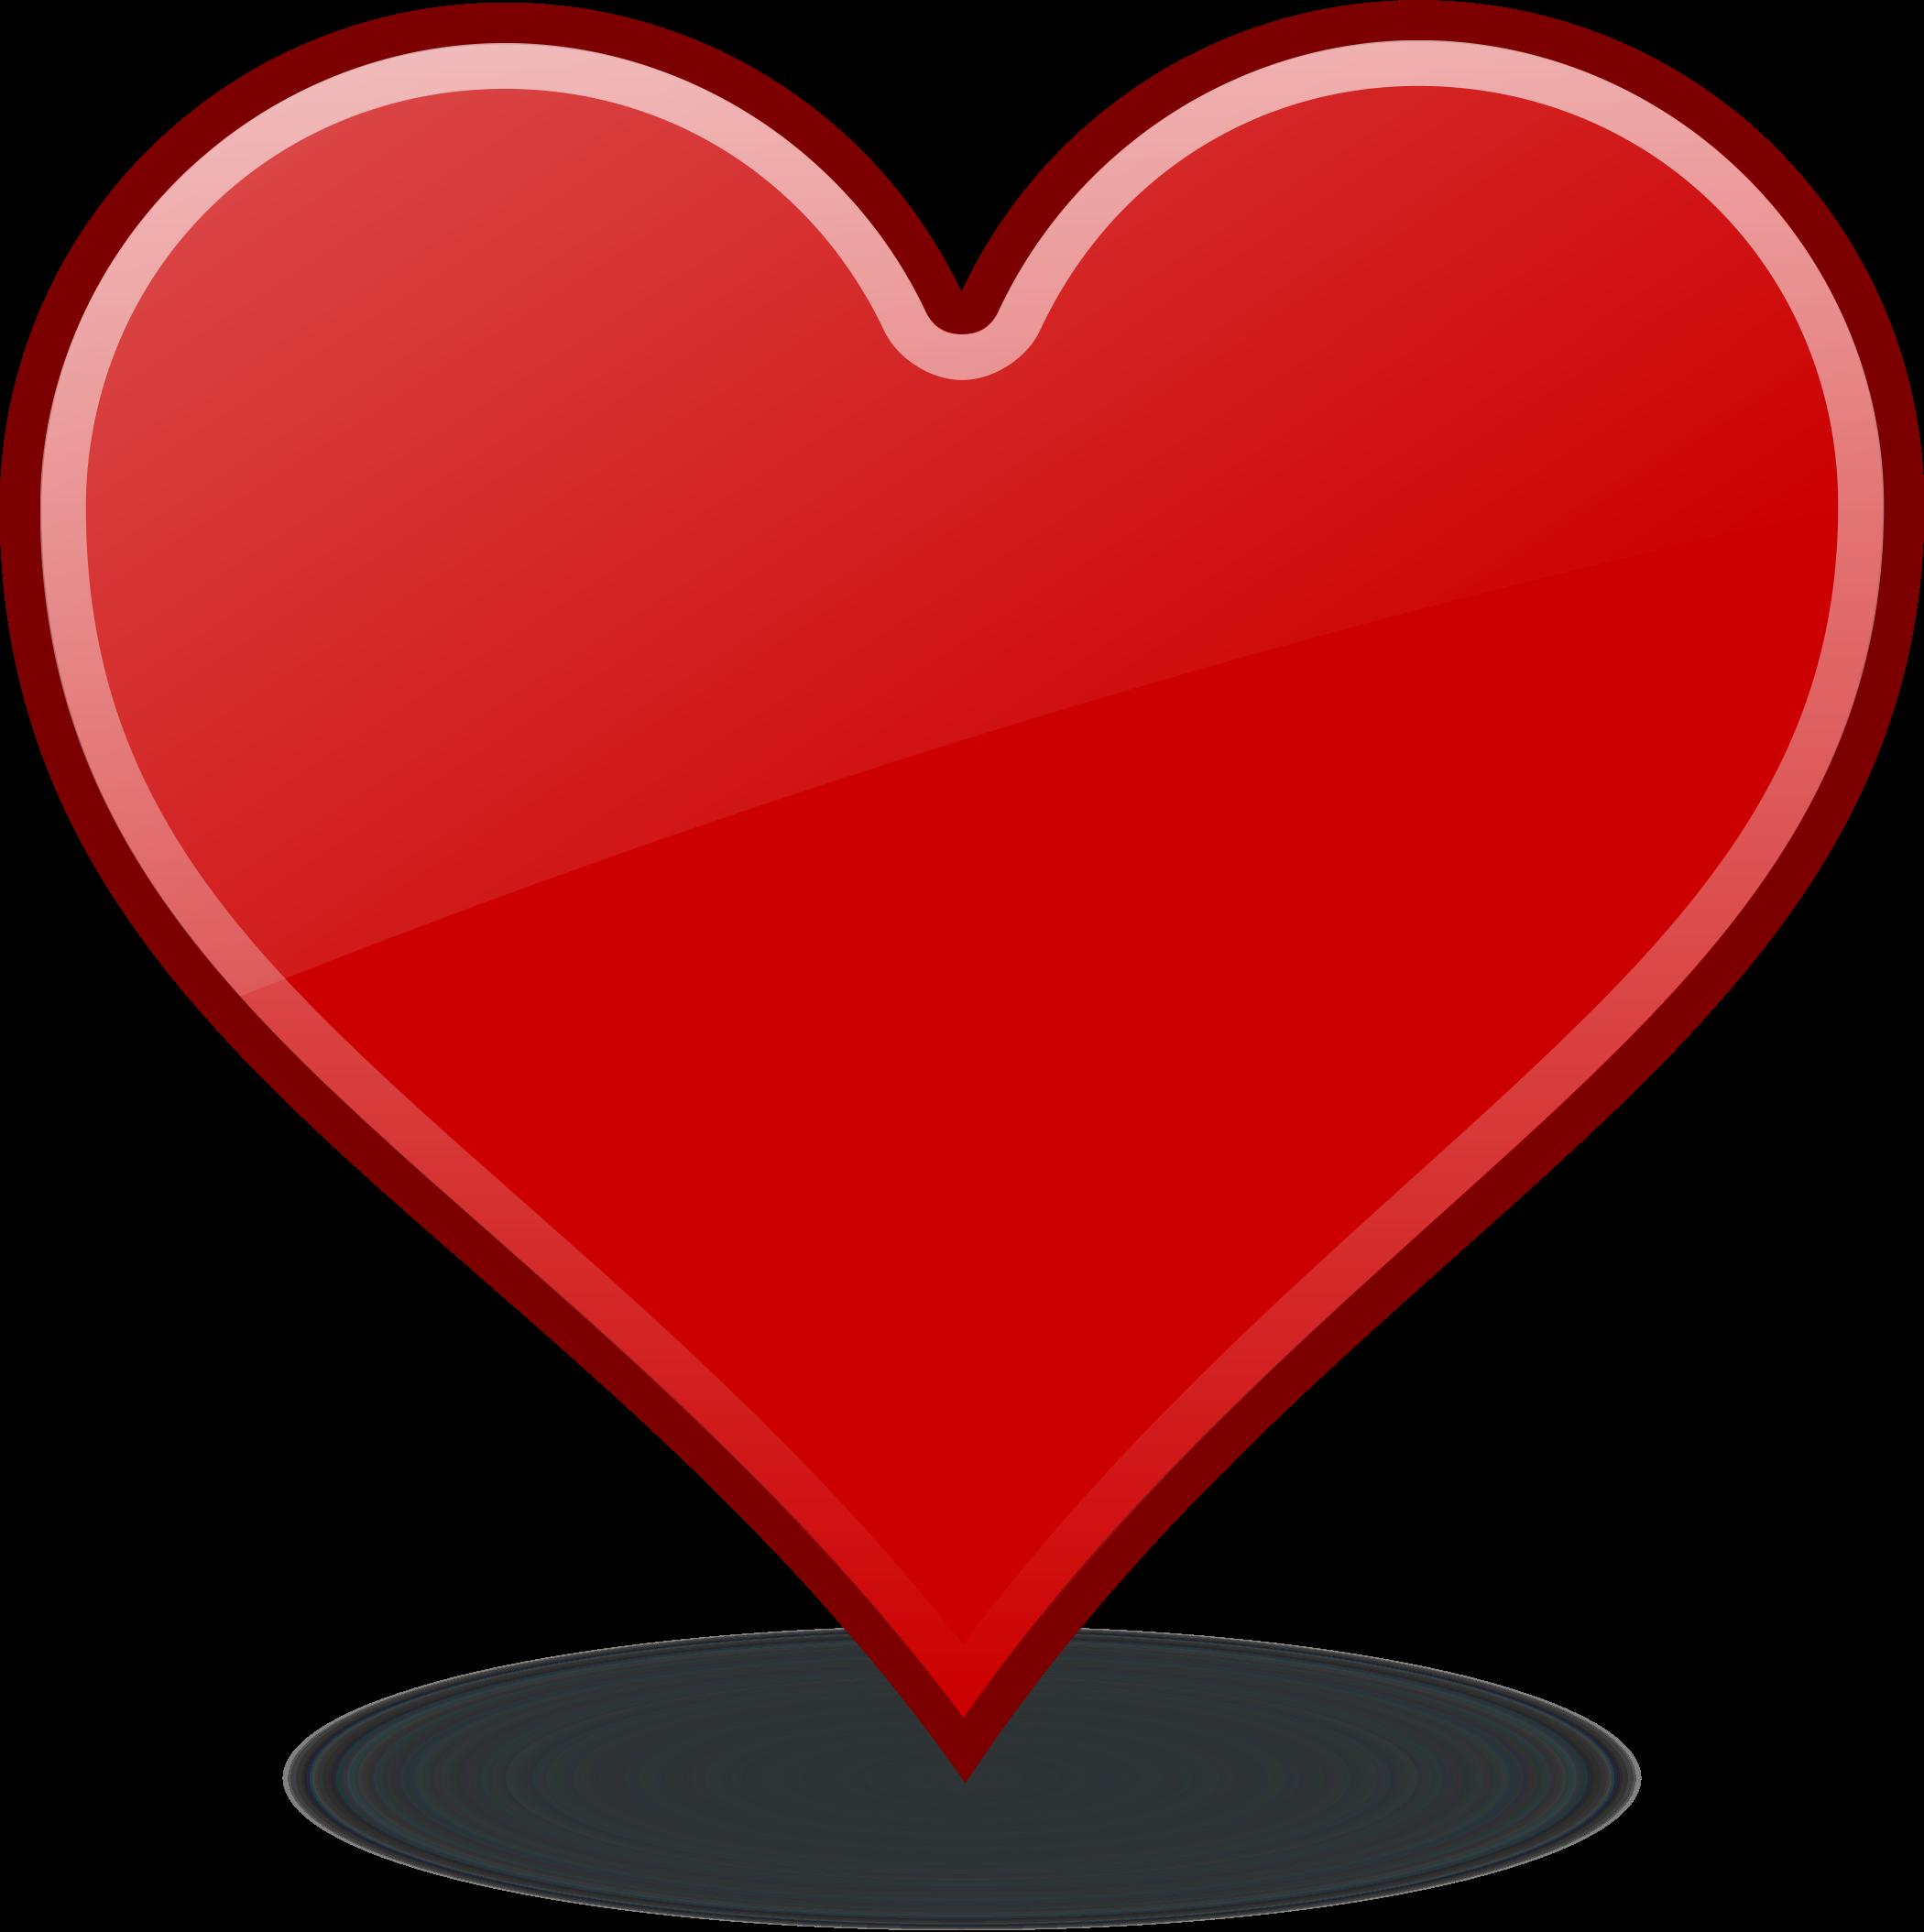 emoji heart icon - photo #6